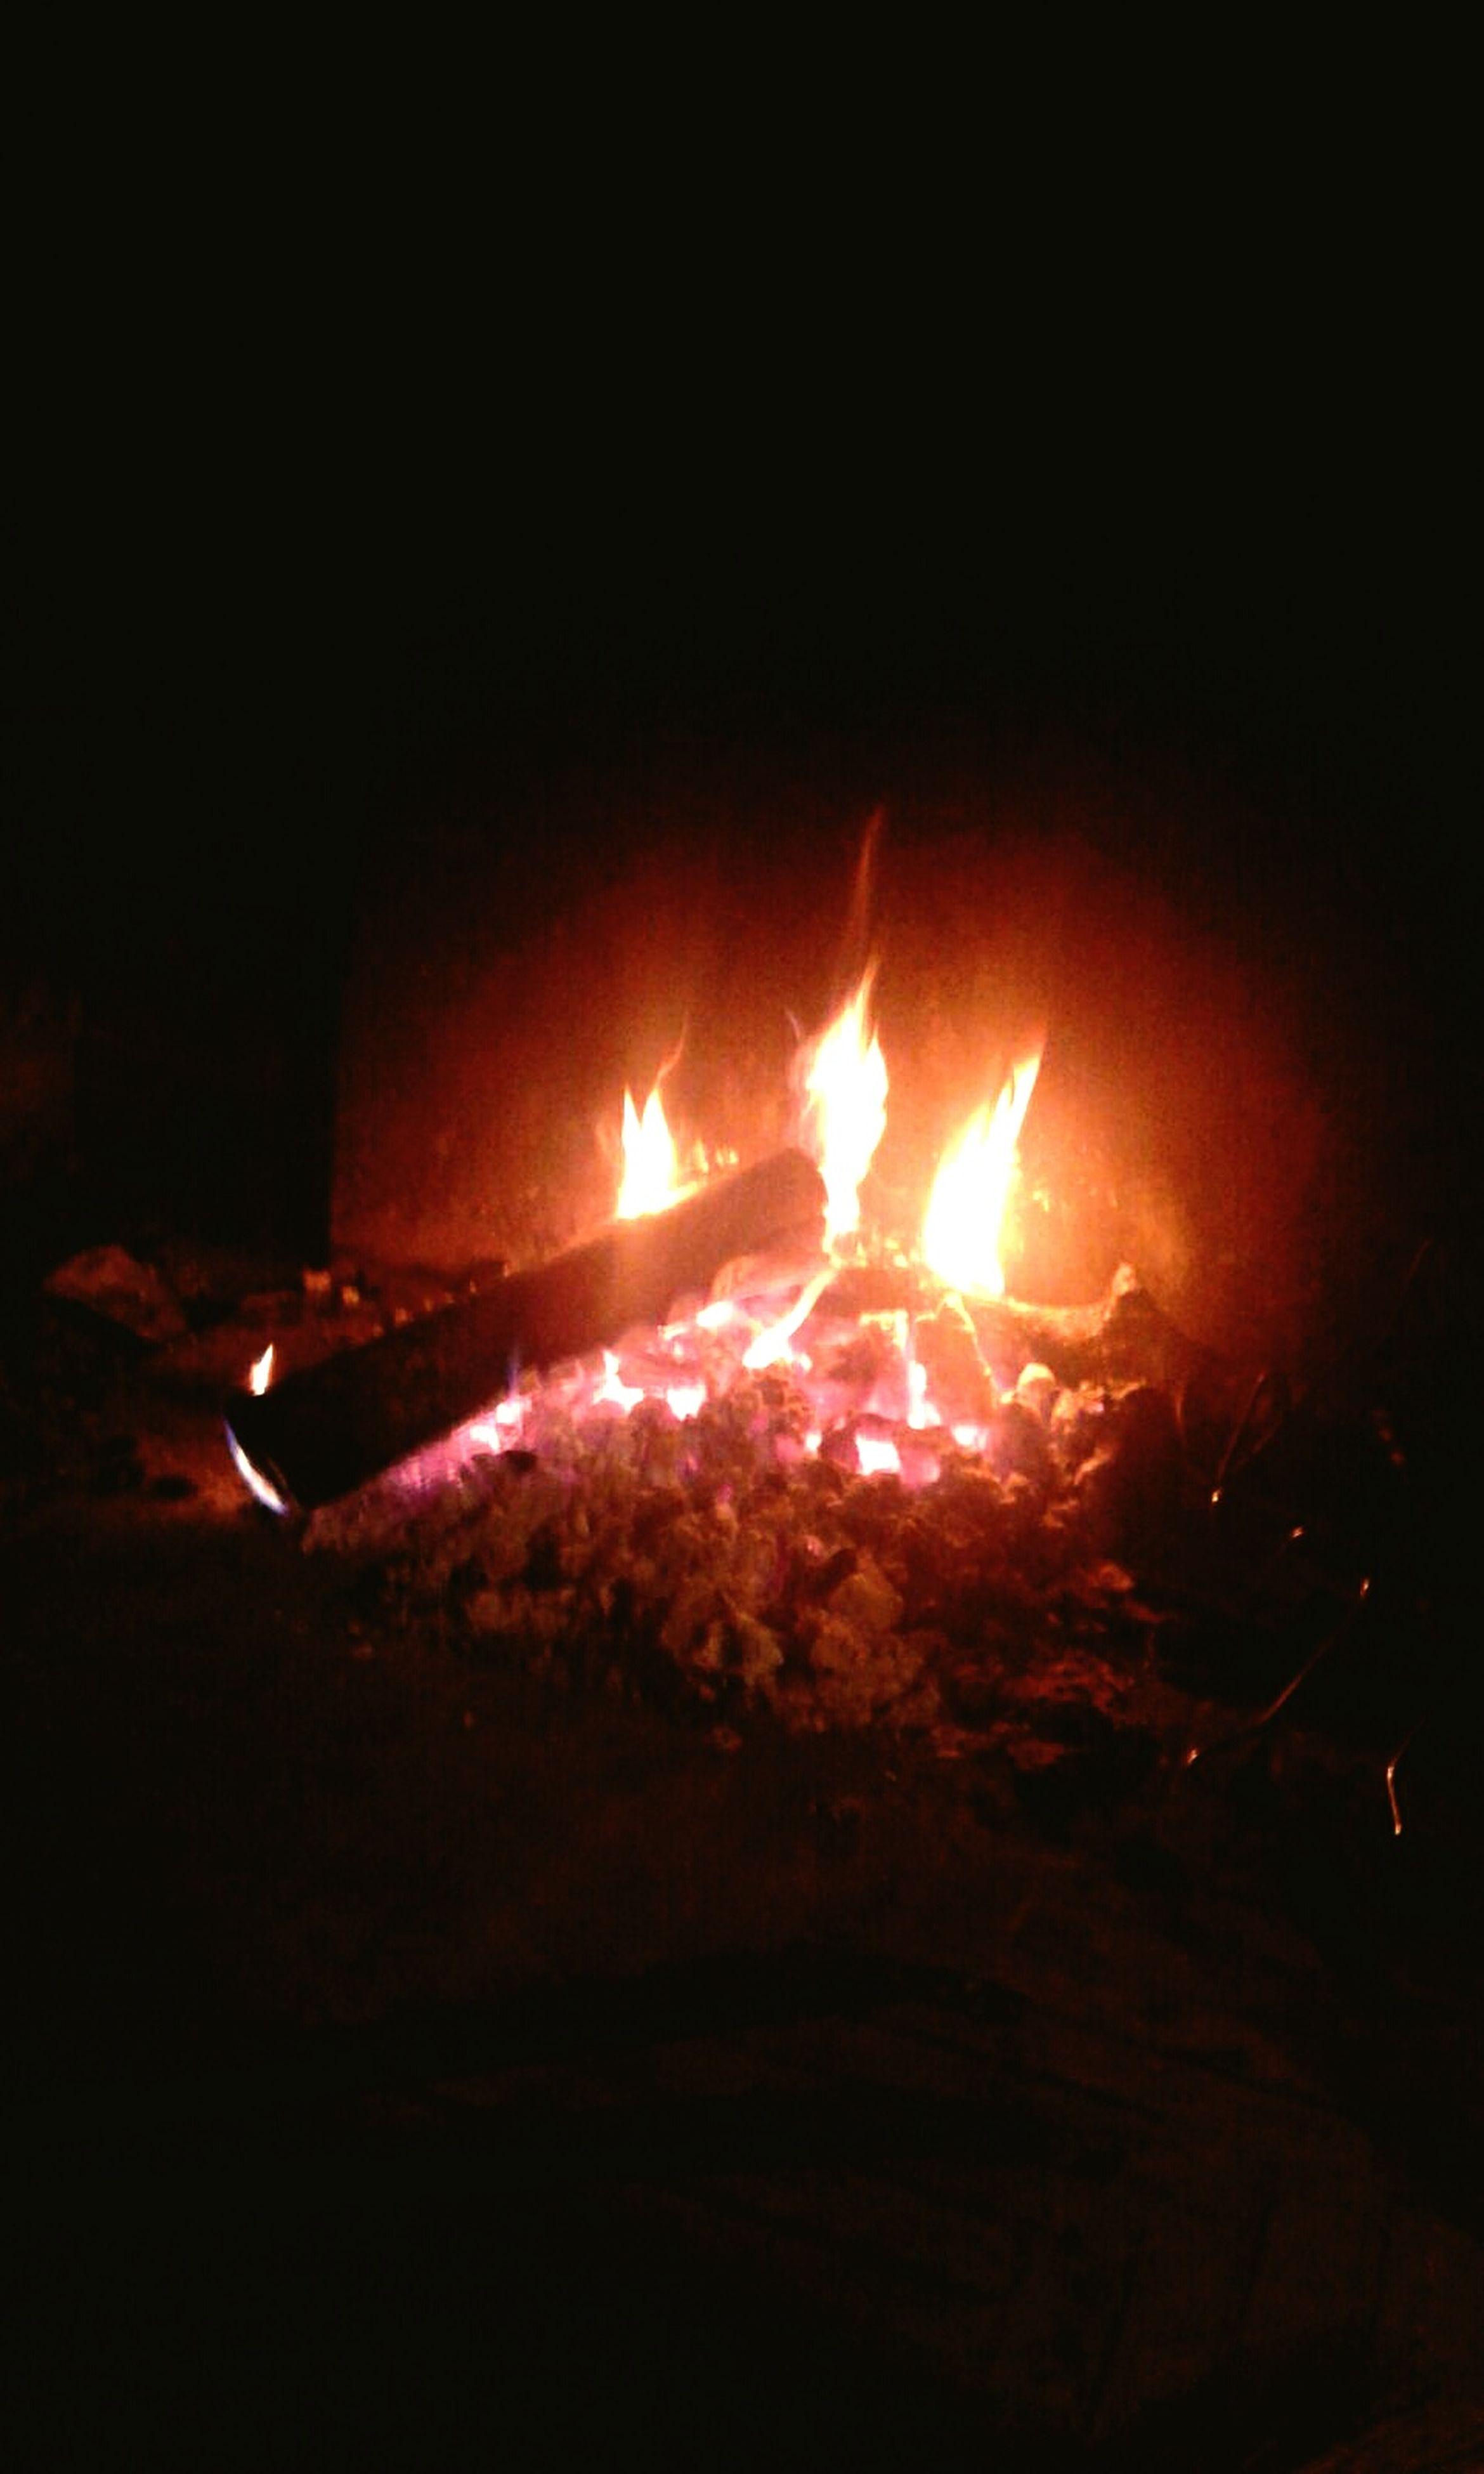 heat - temperature, burning, flame, night, dark, no people, outdoors, close-up